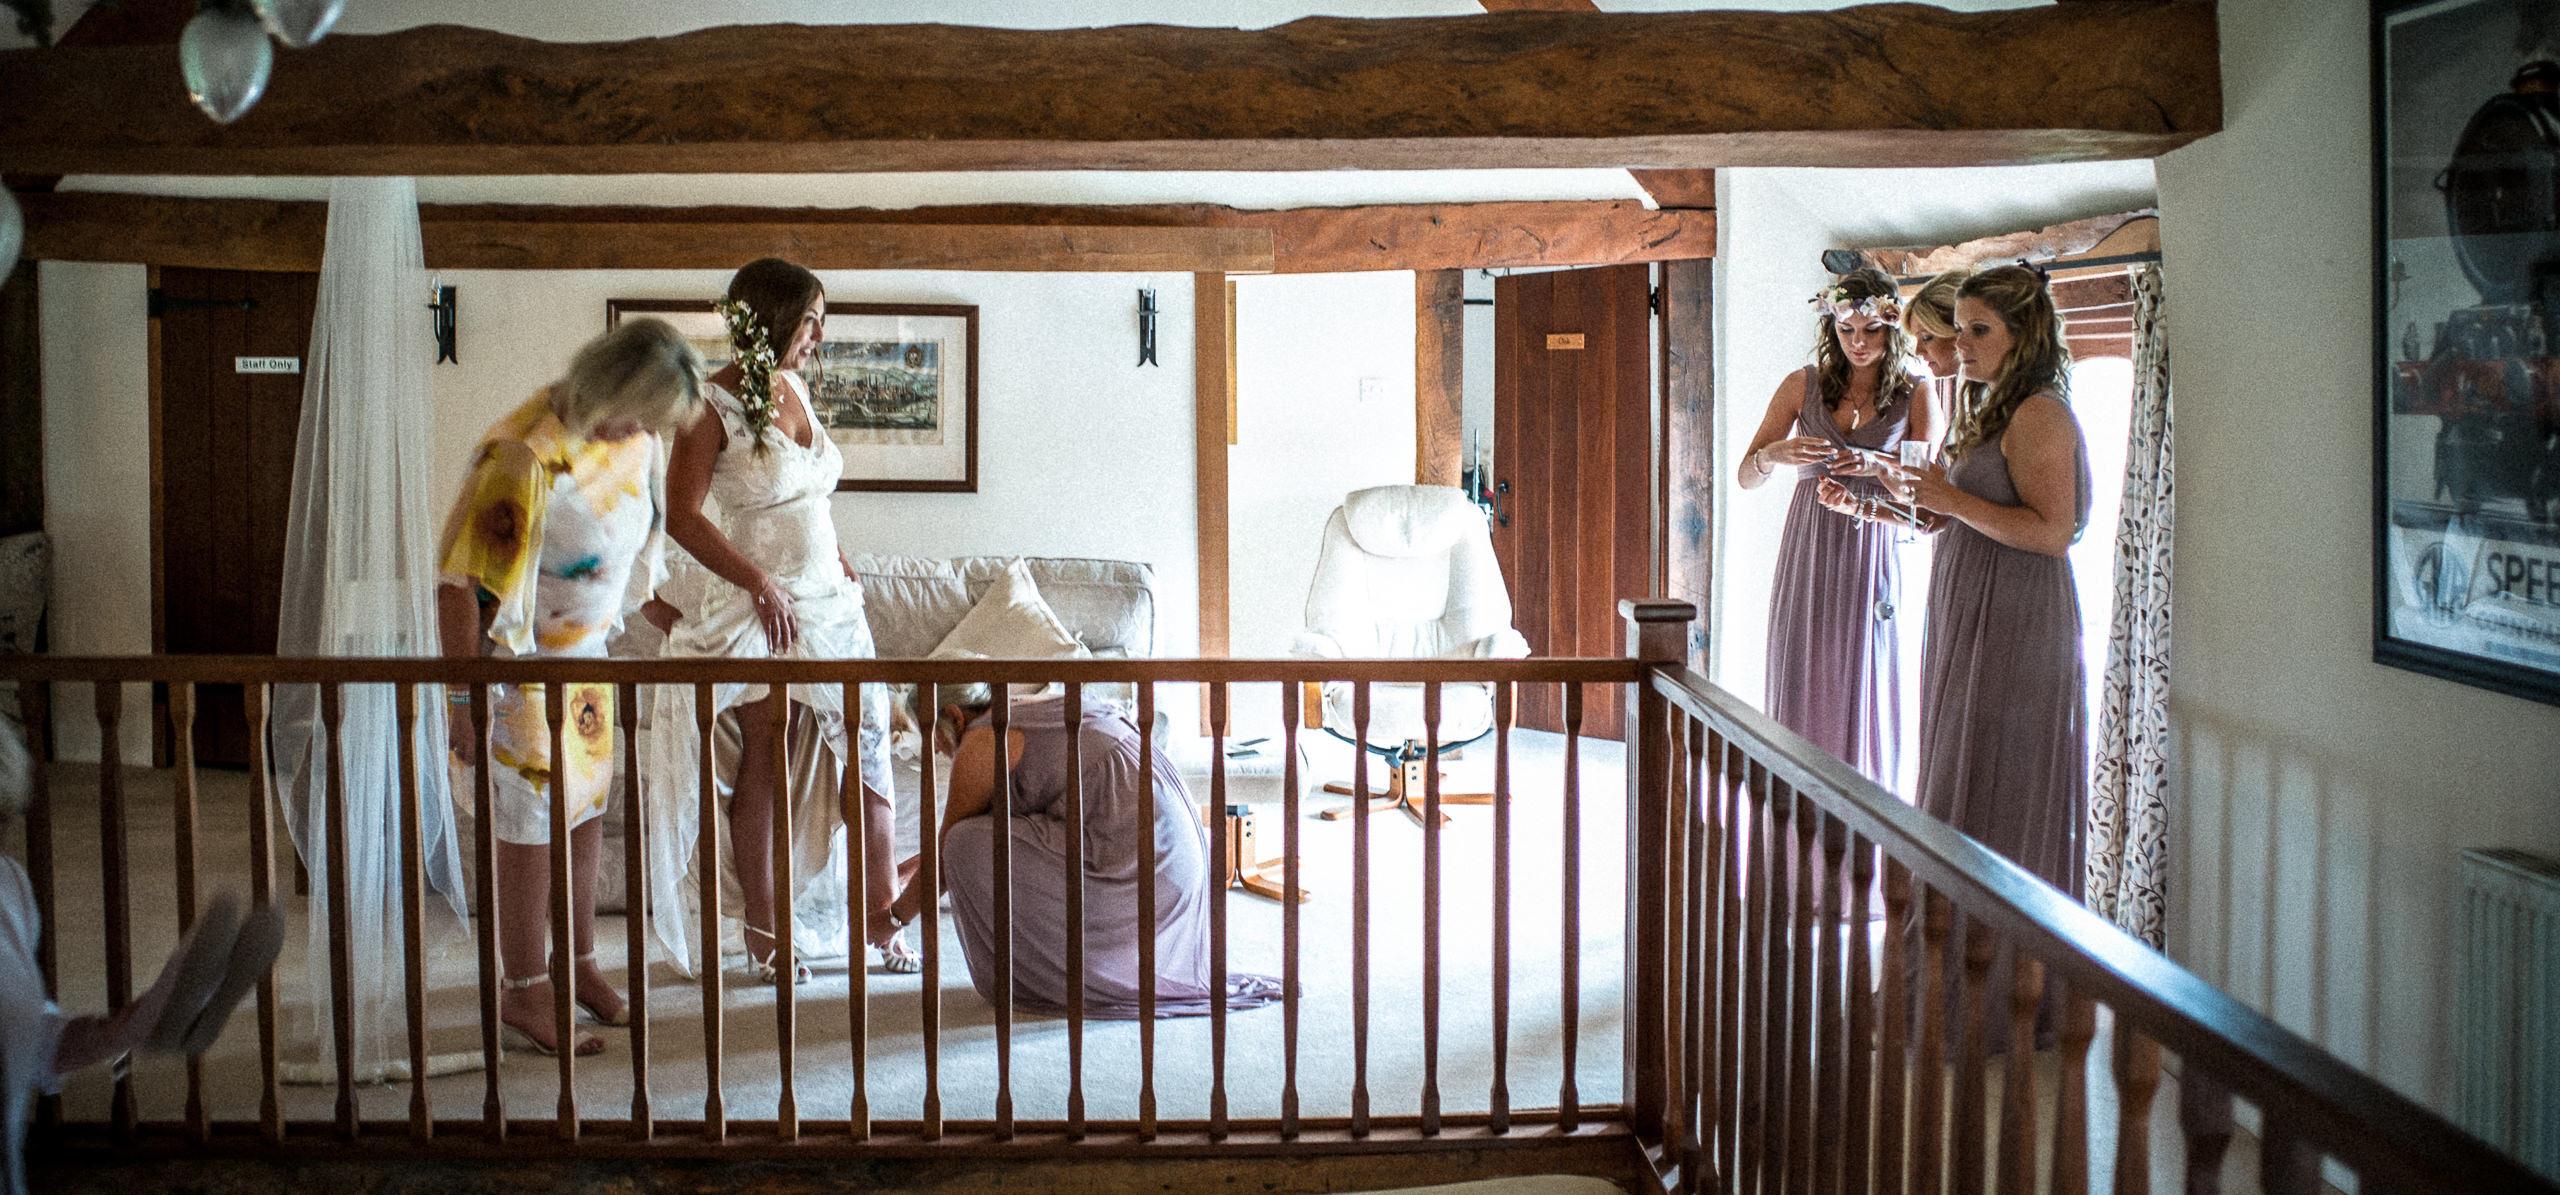 Wedding Gallery On The Farm By Brett Leica Photographer 13